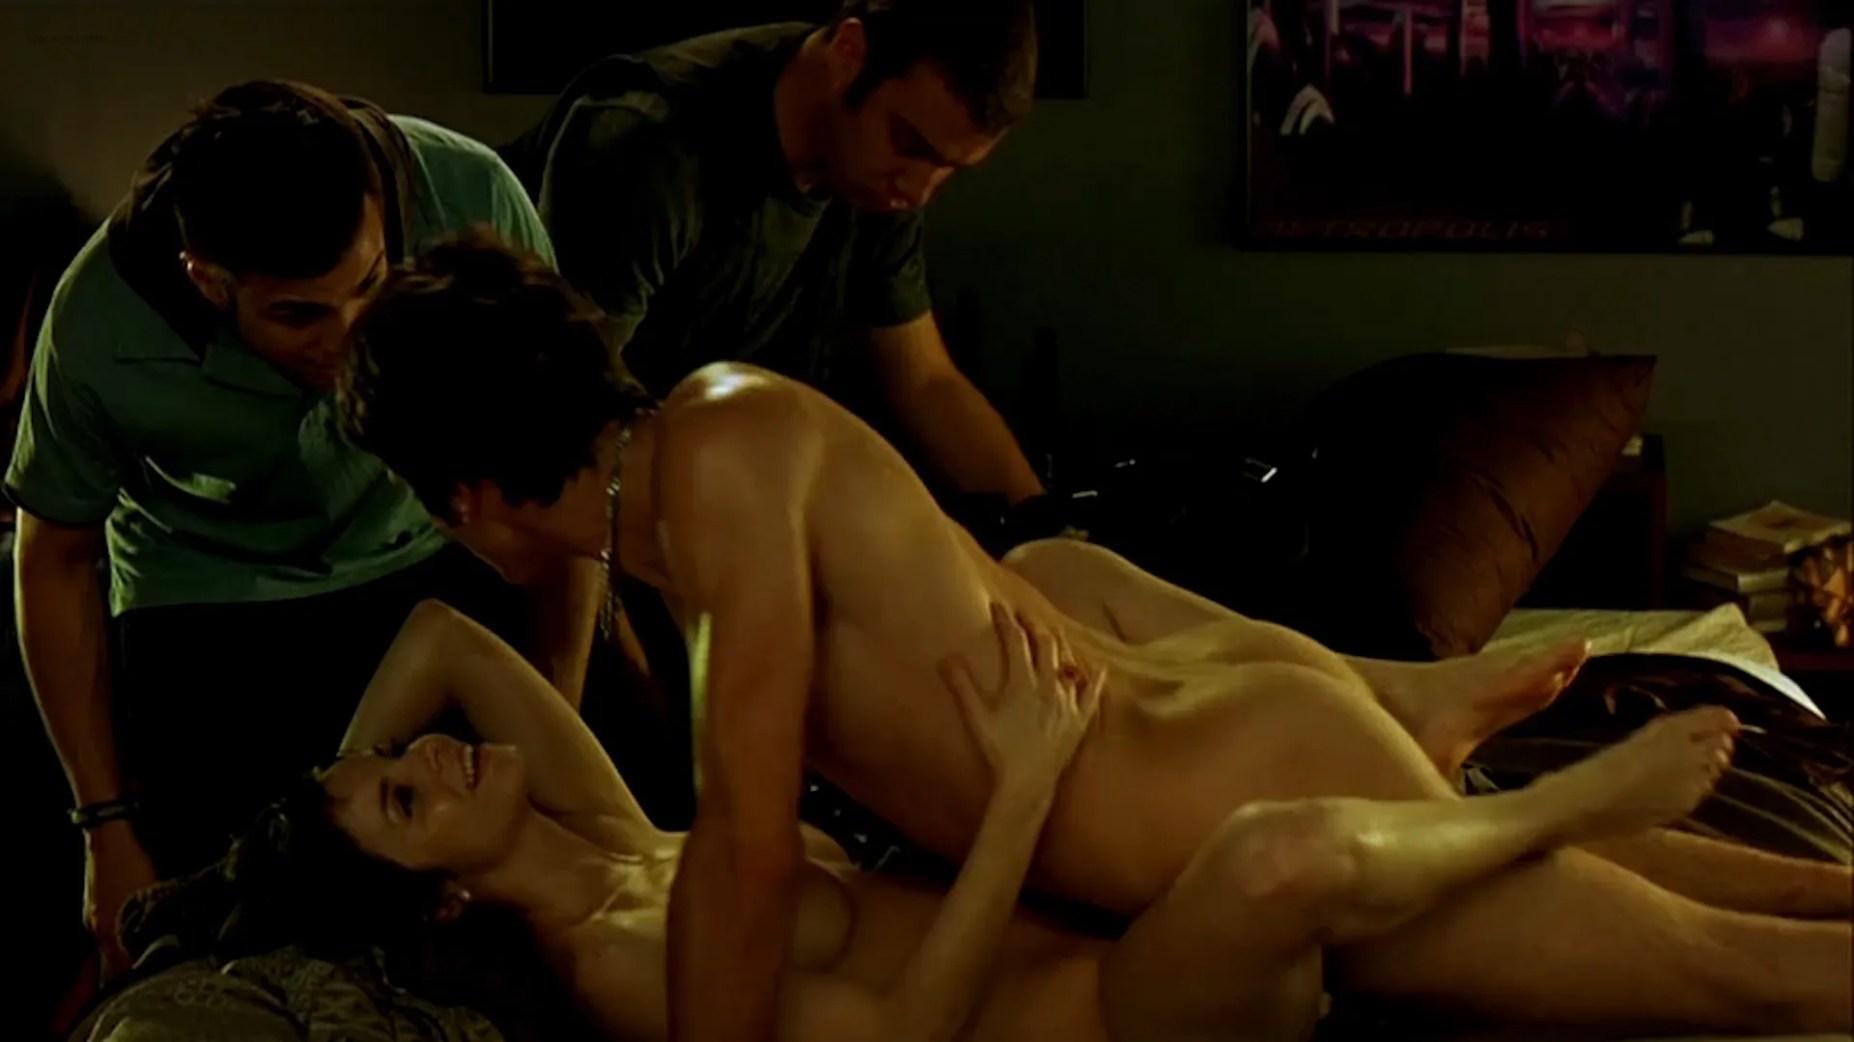 sex-and-death-sex-scene